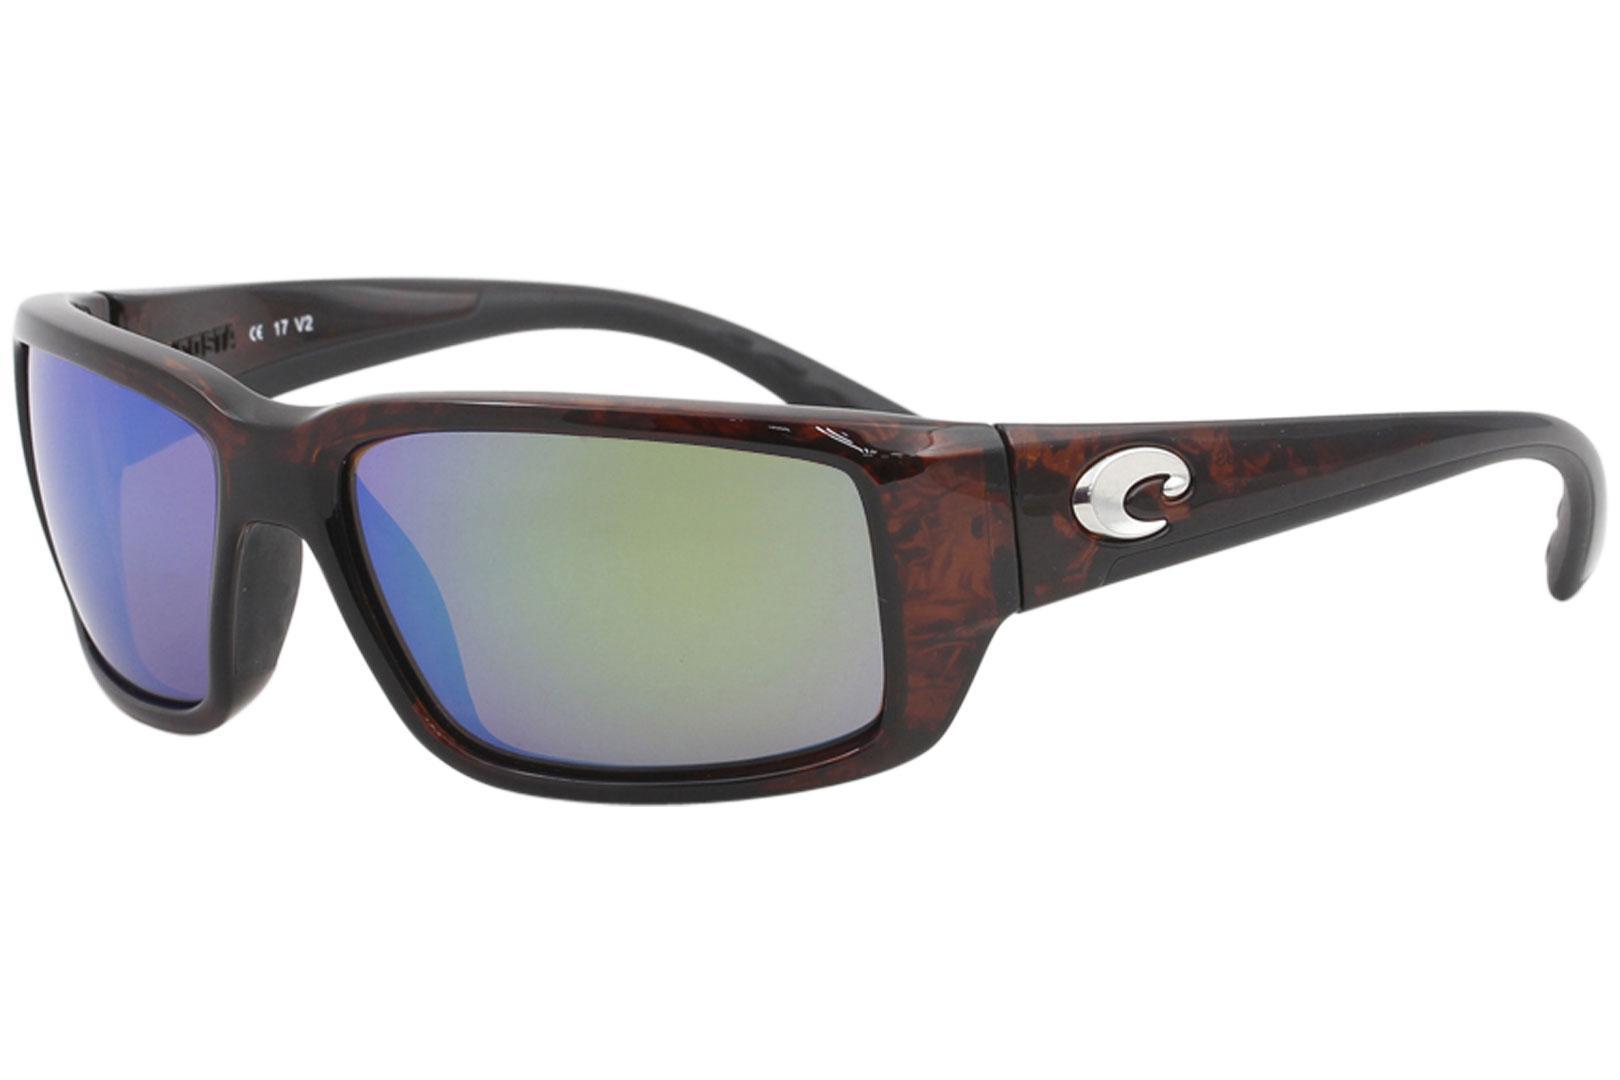 5e047aaf1fbaa Costa Del Mar Men s Fantail Polarized Rectangle Wrap Sunglasses by Costa  Del Mar